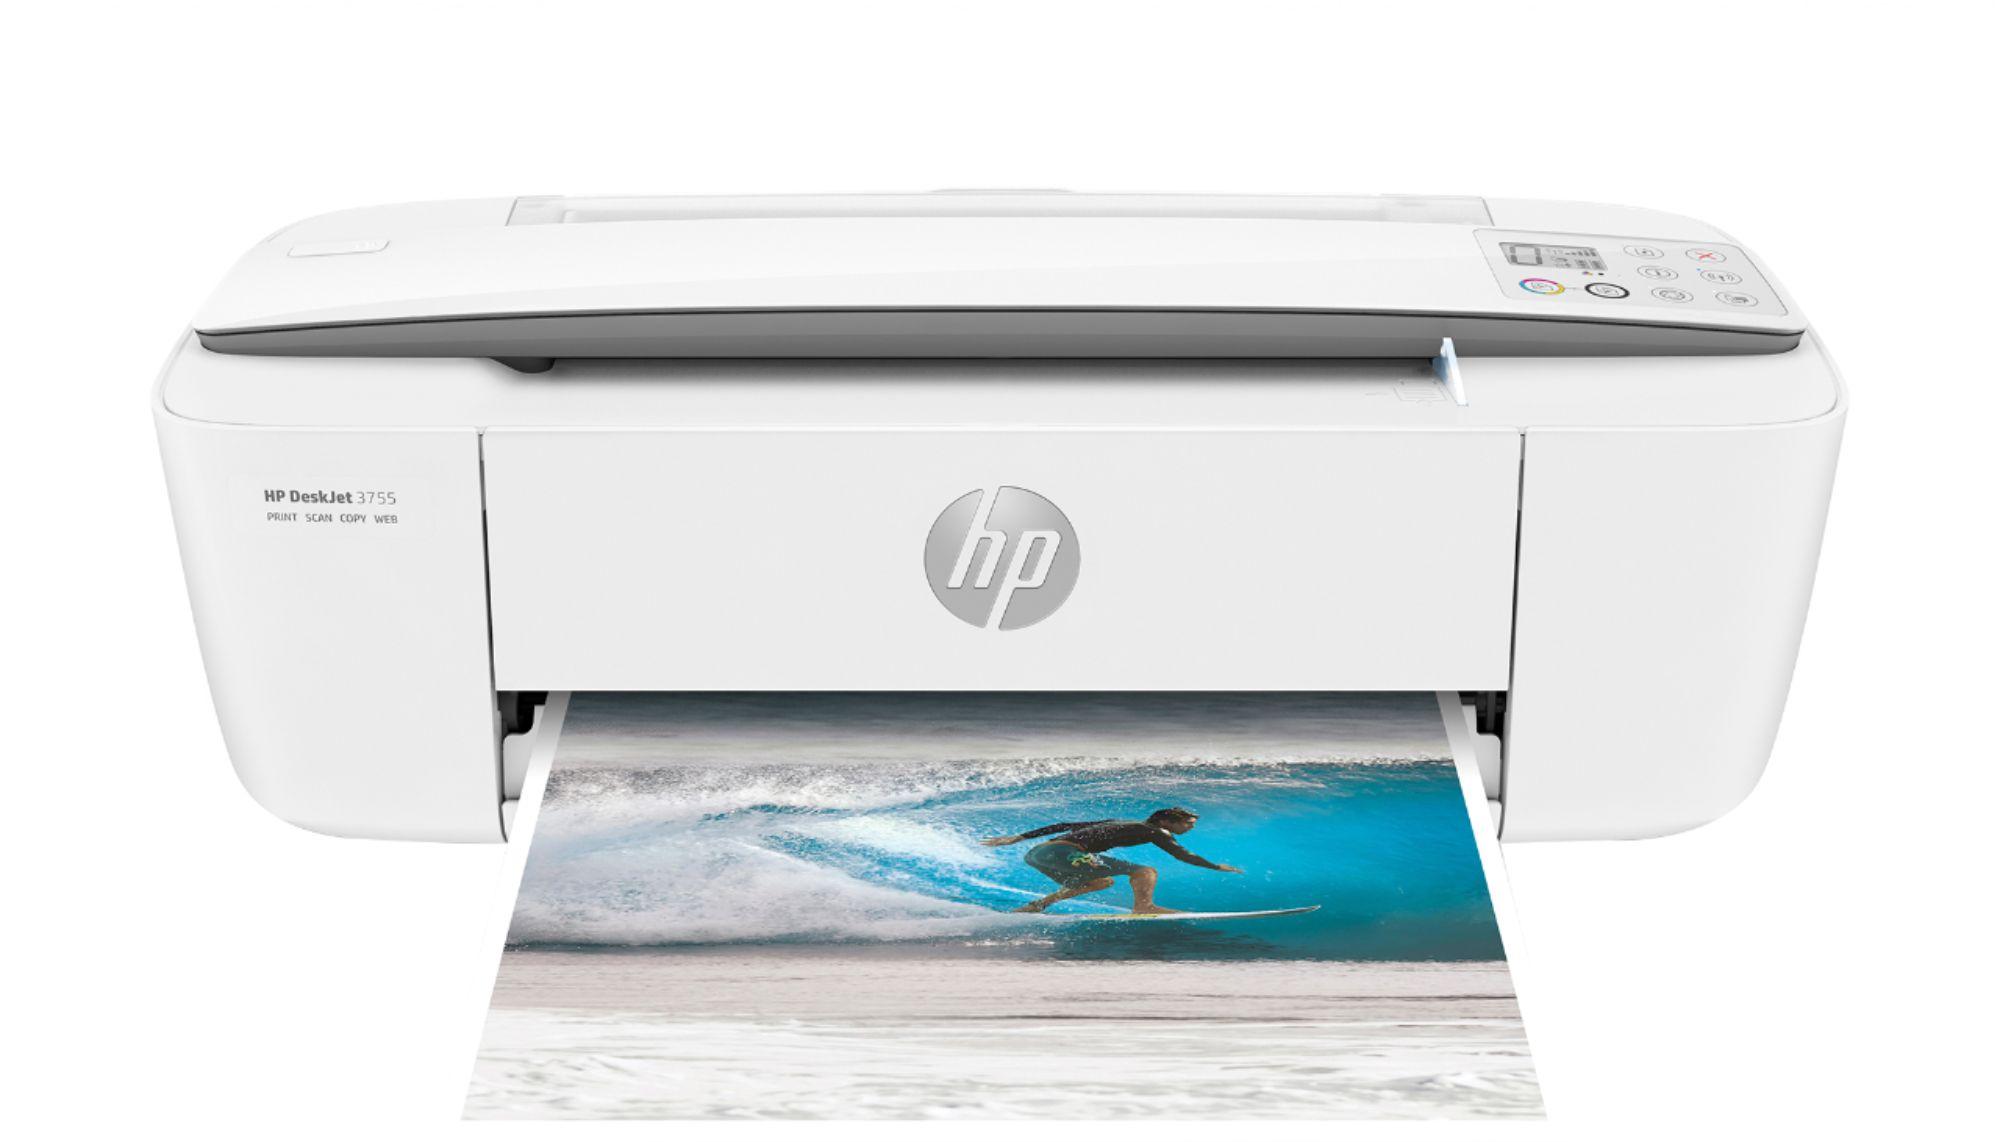 HP Printer Error Code oxc4eb827f - How to fix